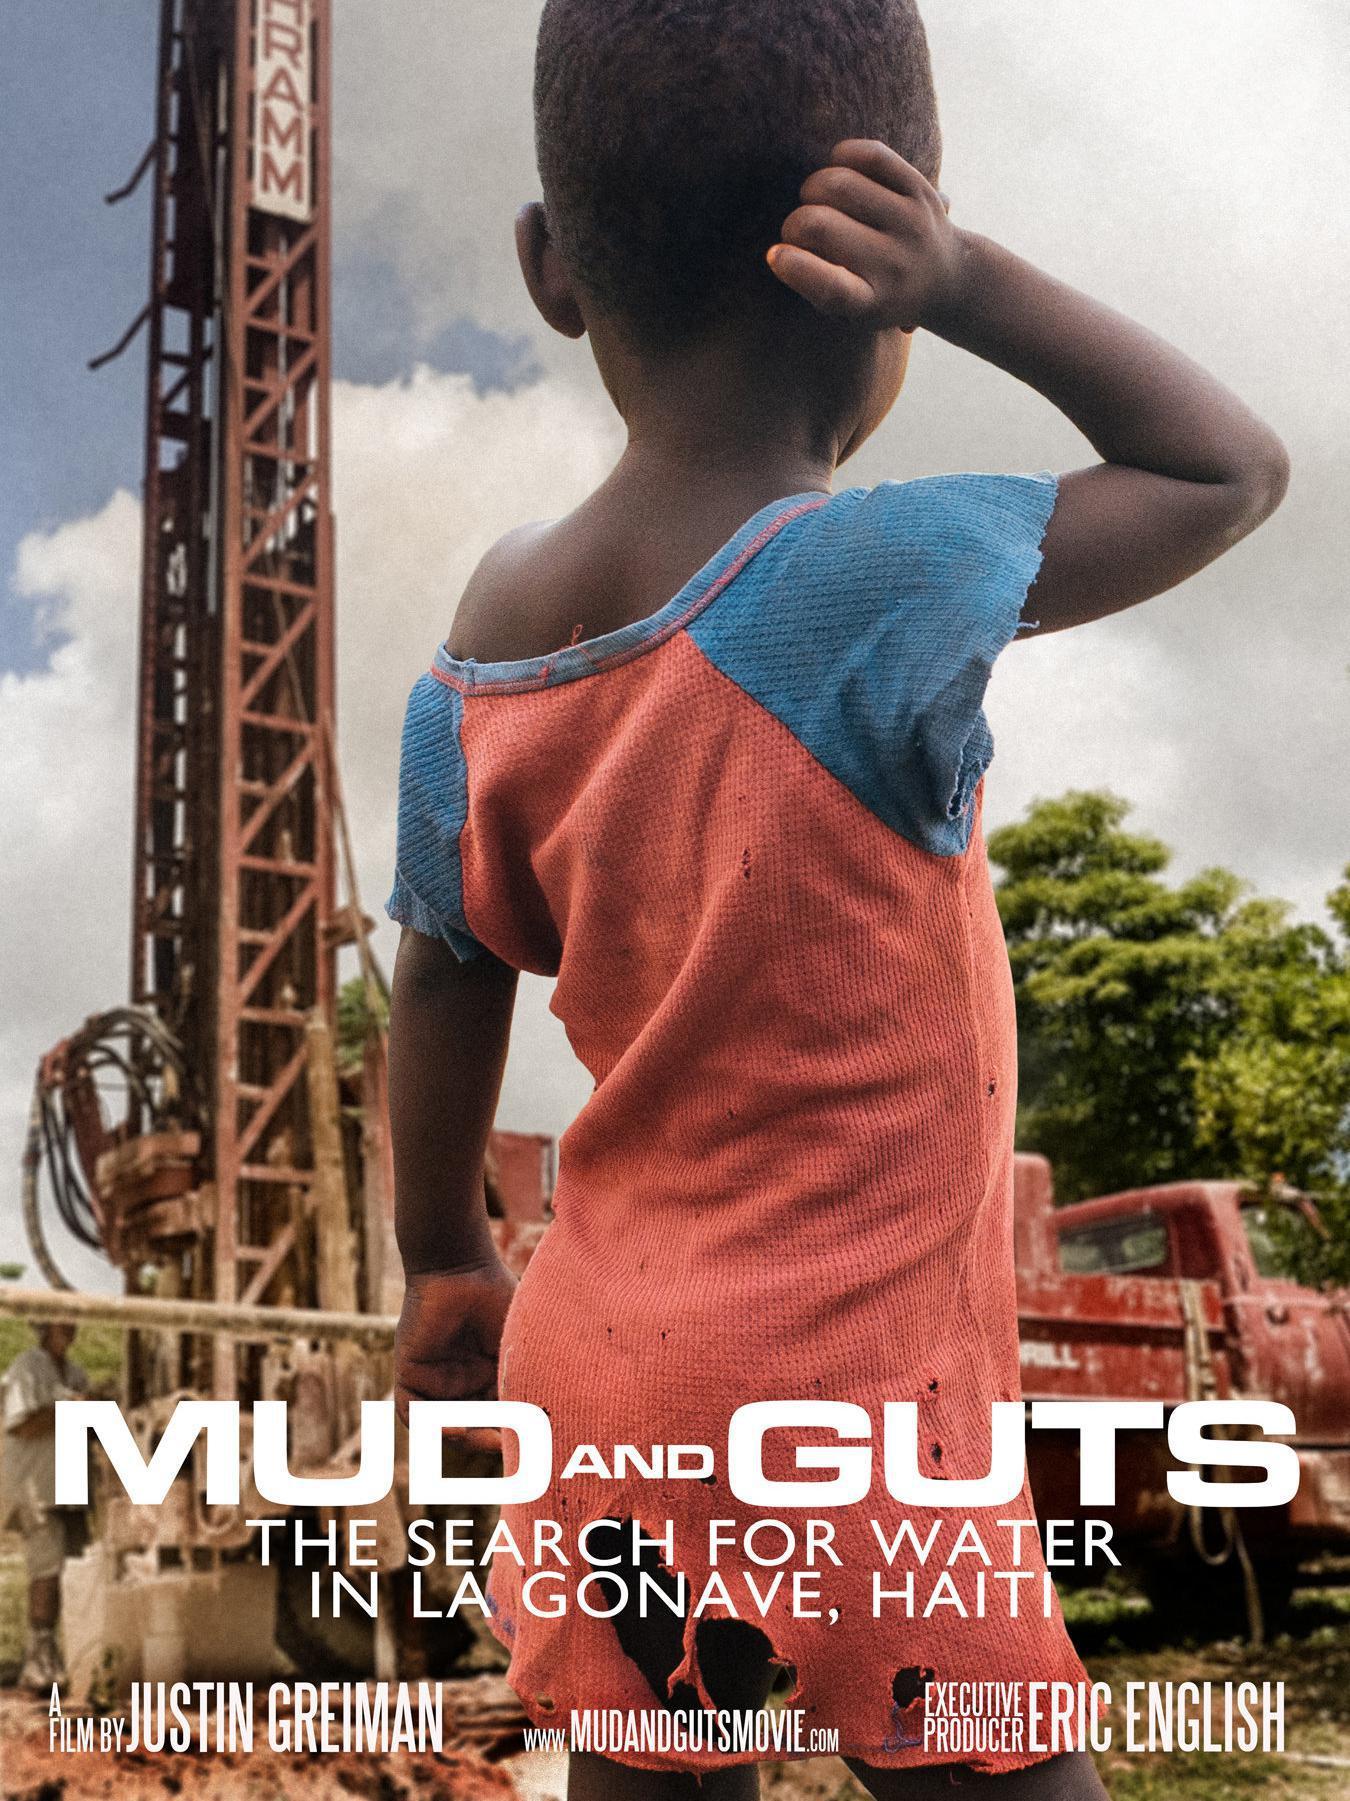 Mud and Guts